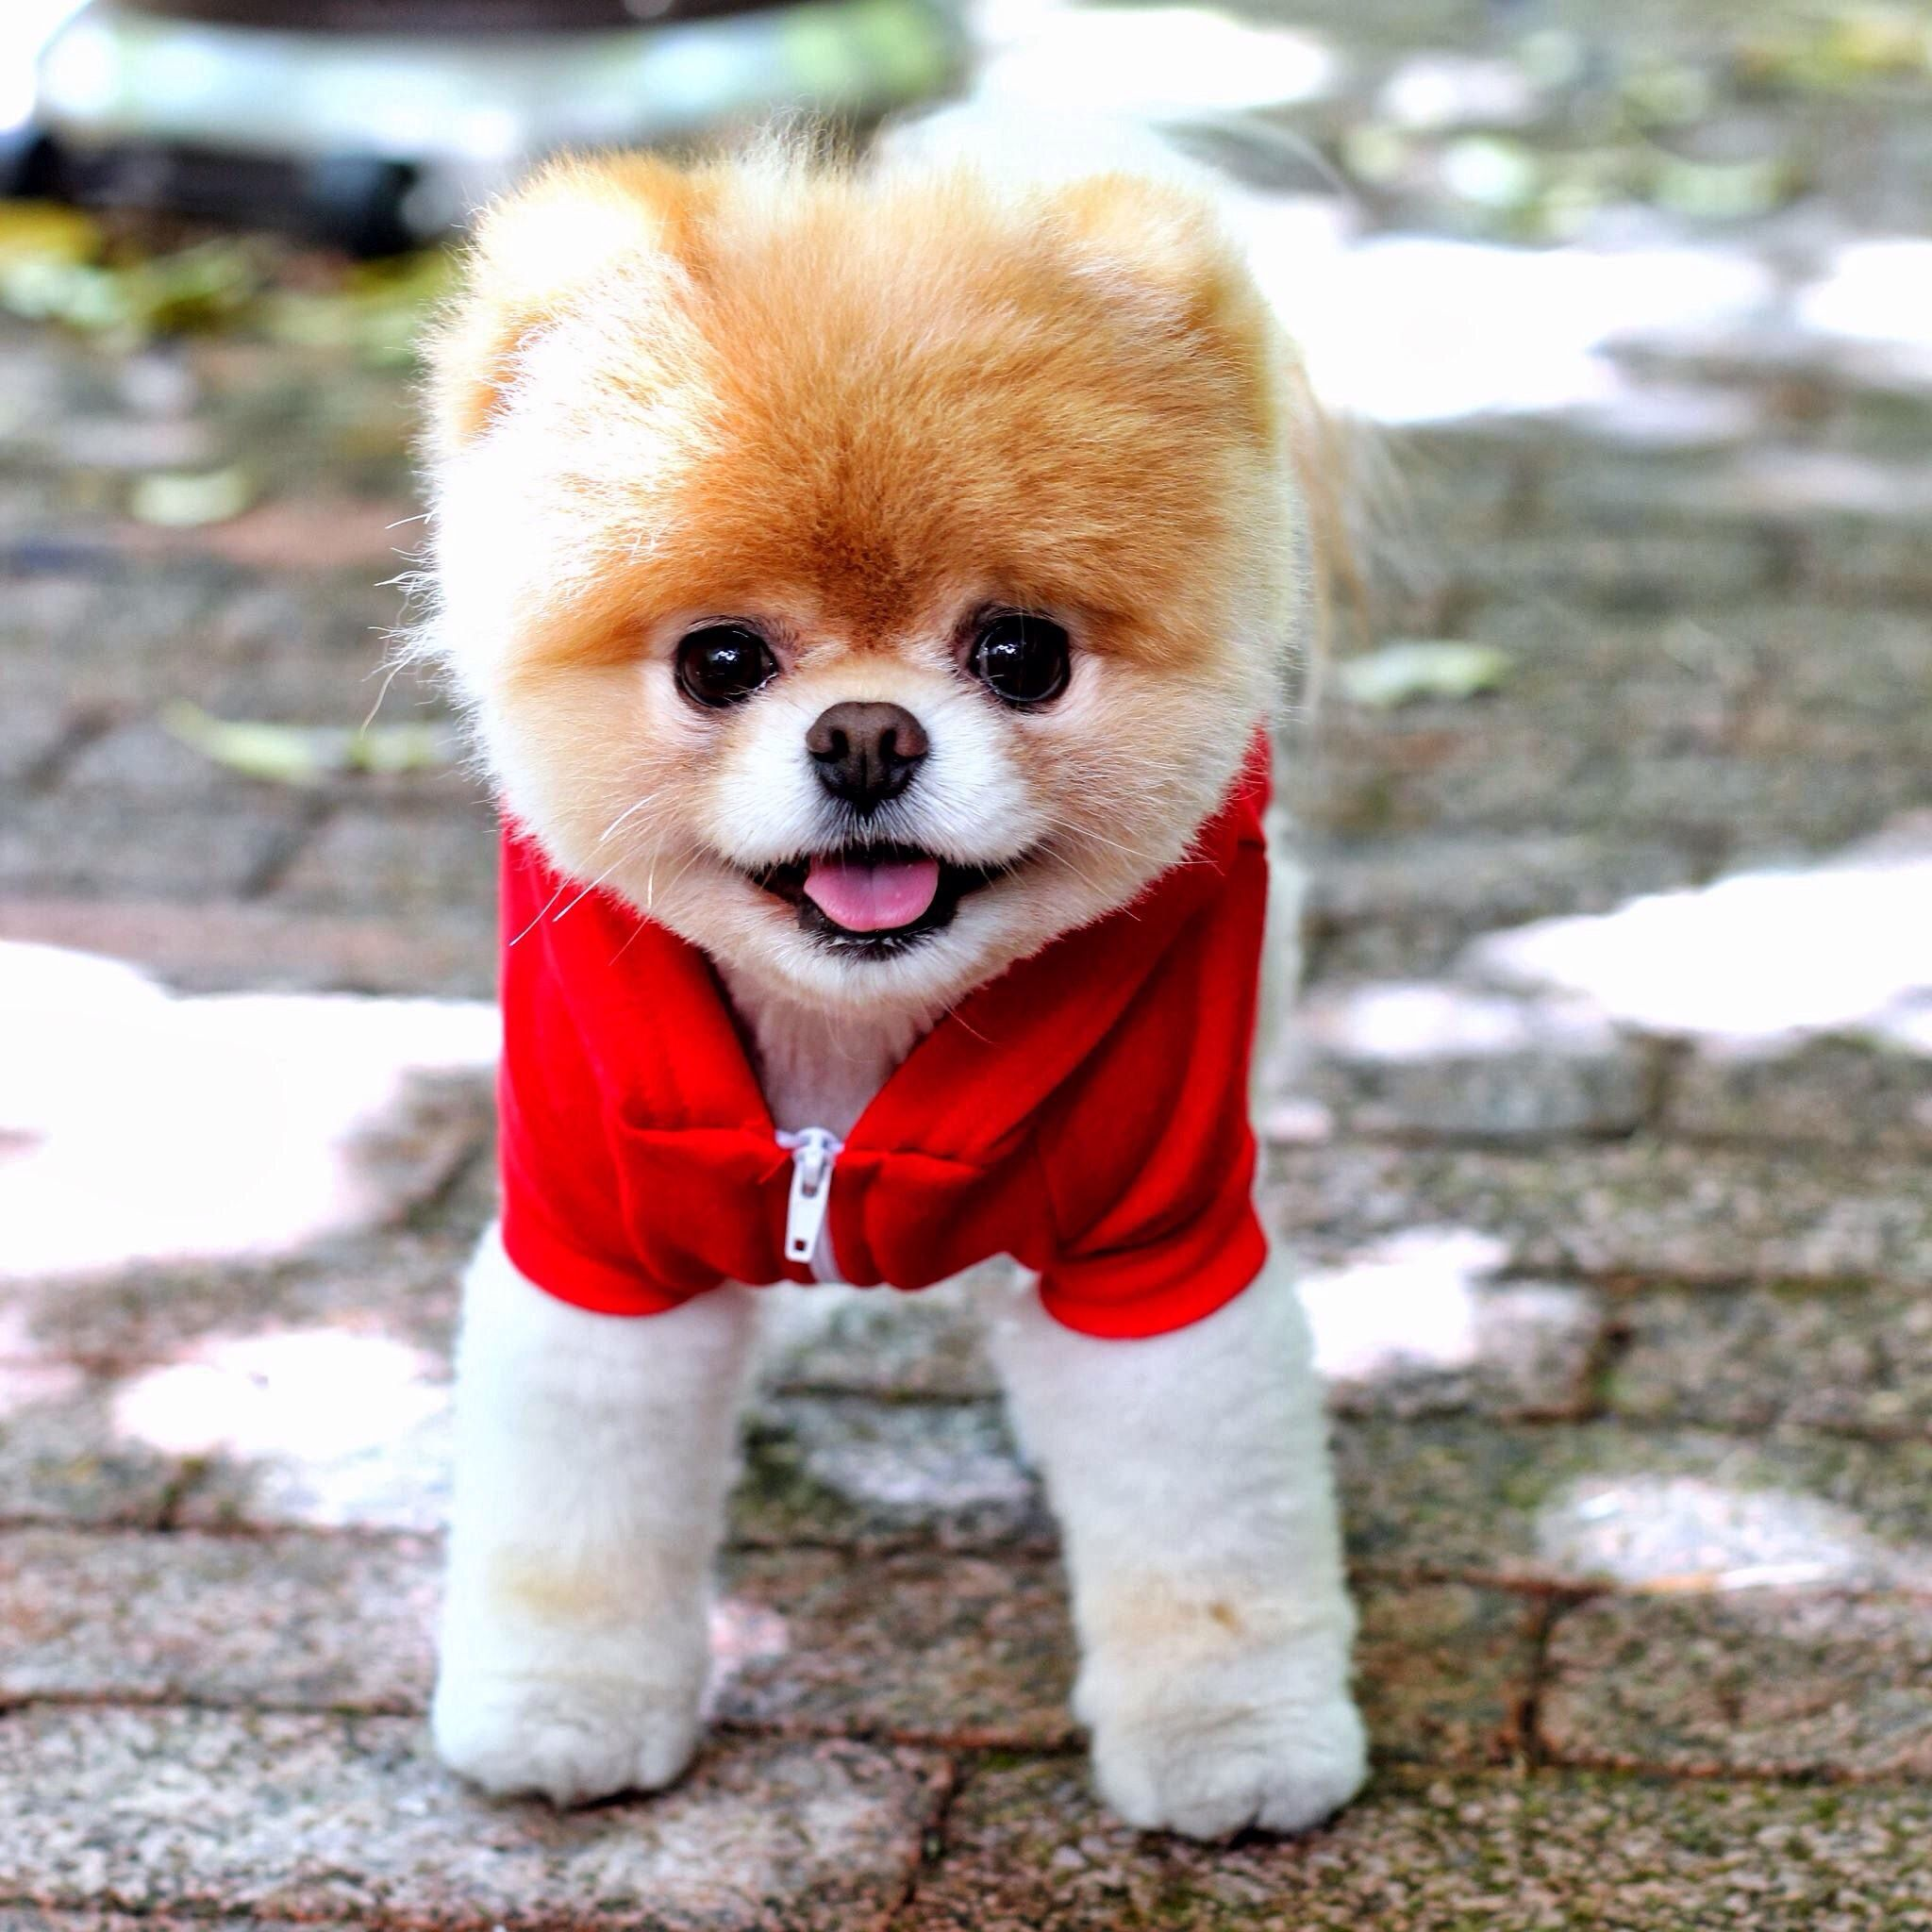 Top Boo Chubby Adorable Dog - 8ec42c17ef17c56d3efdd8ecbf40724b  Graphic_903492  .jpg